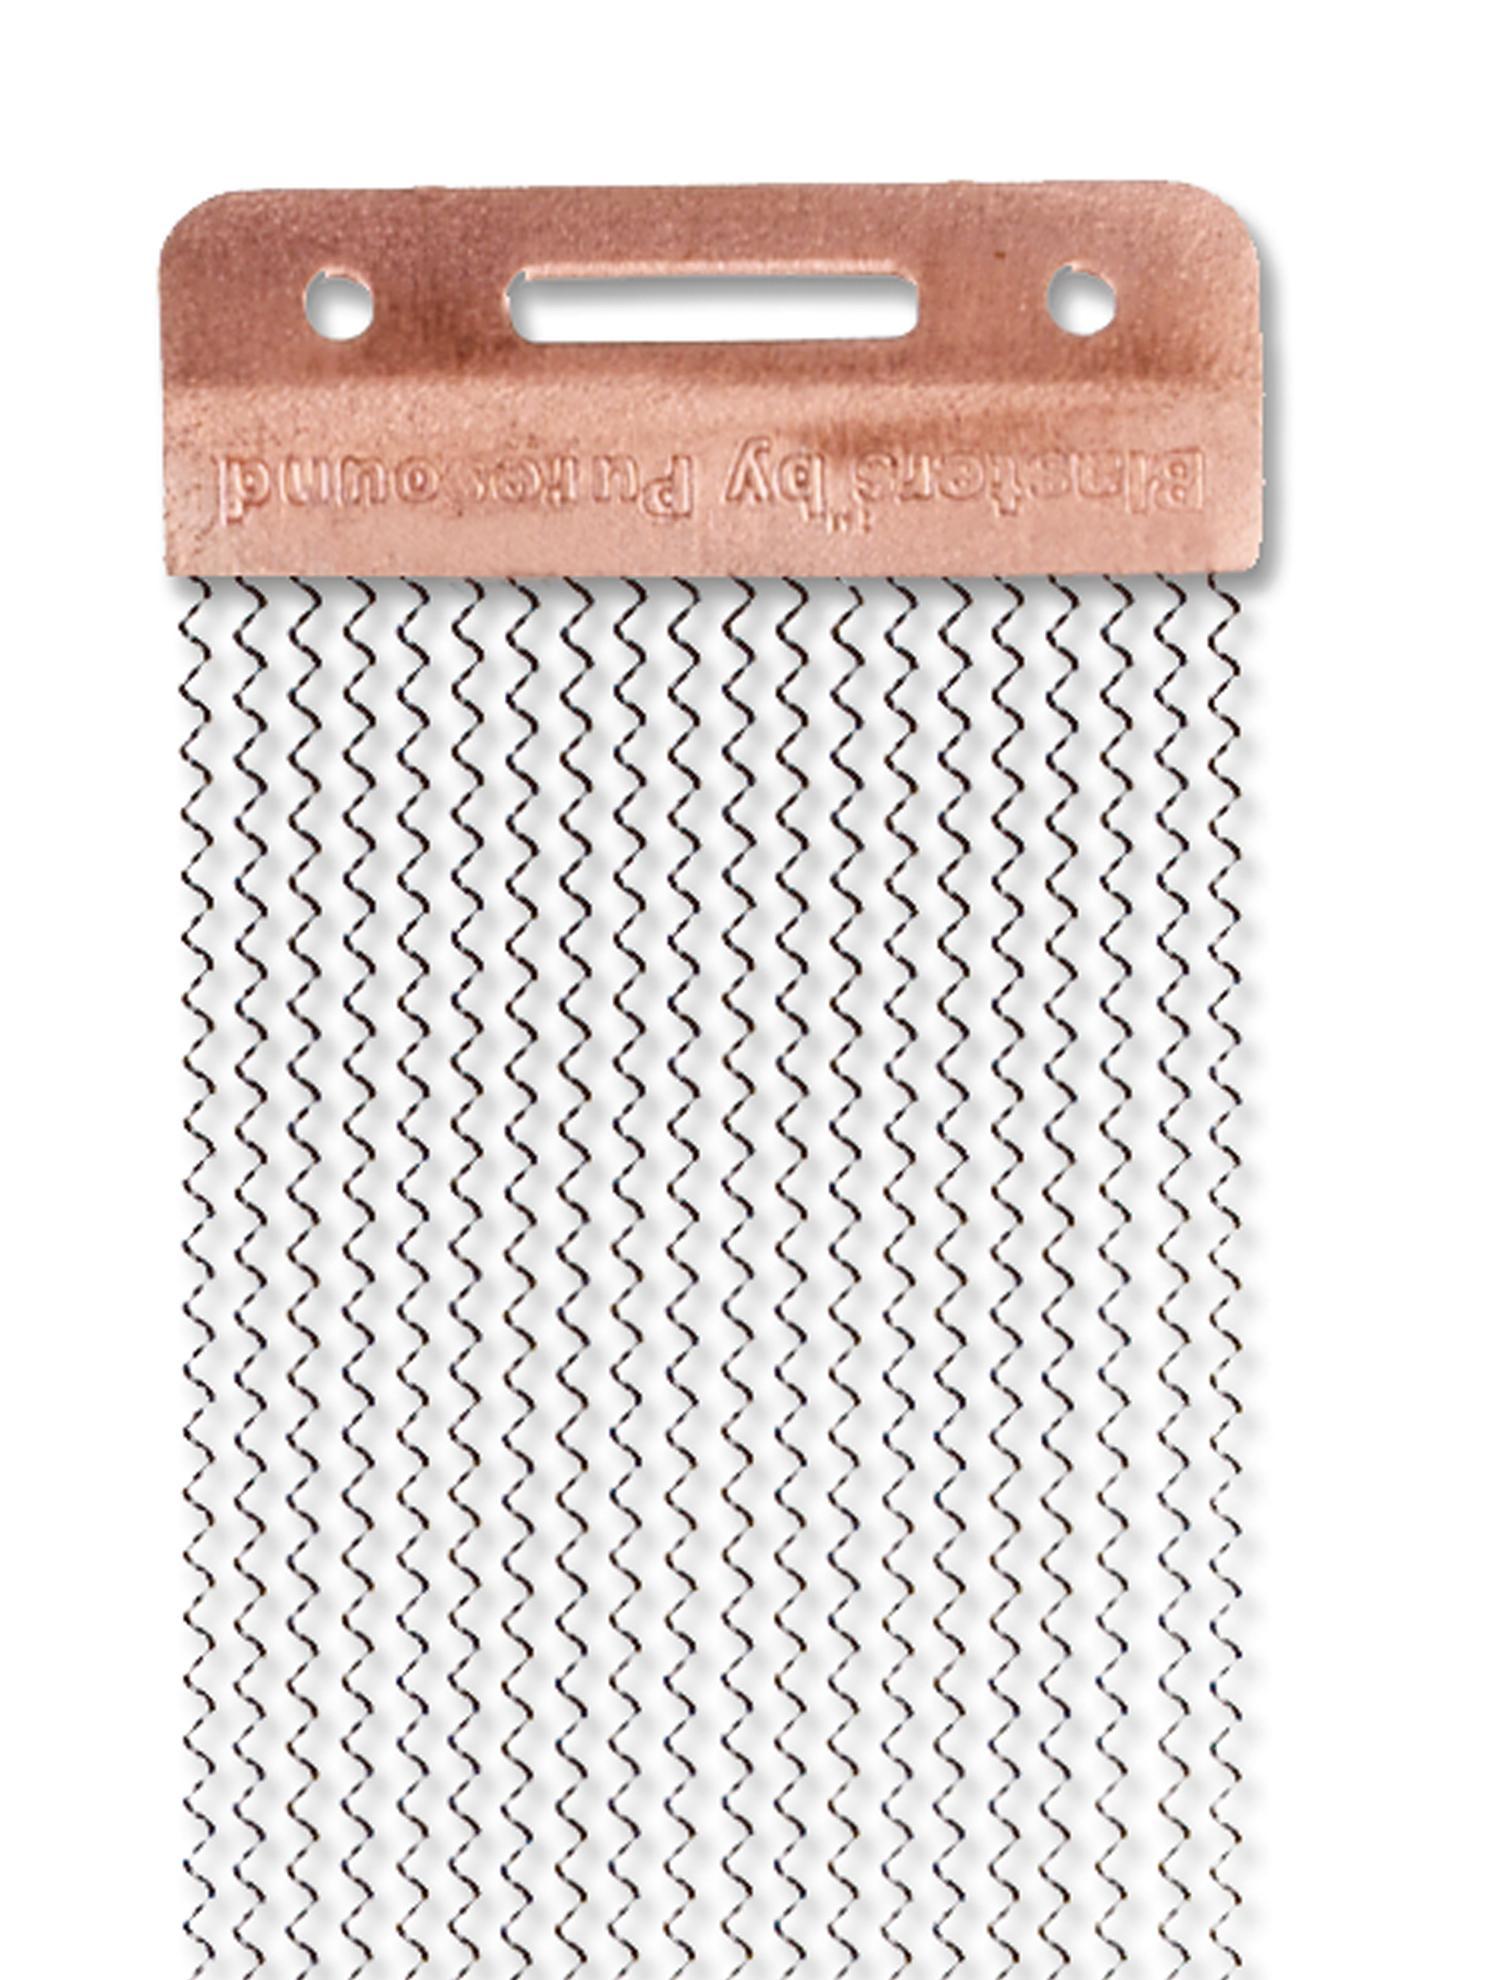 Amazon.com: PureSound Blaster Series Snare Wire, 20 Strand, 14 Inch ...